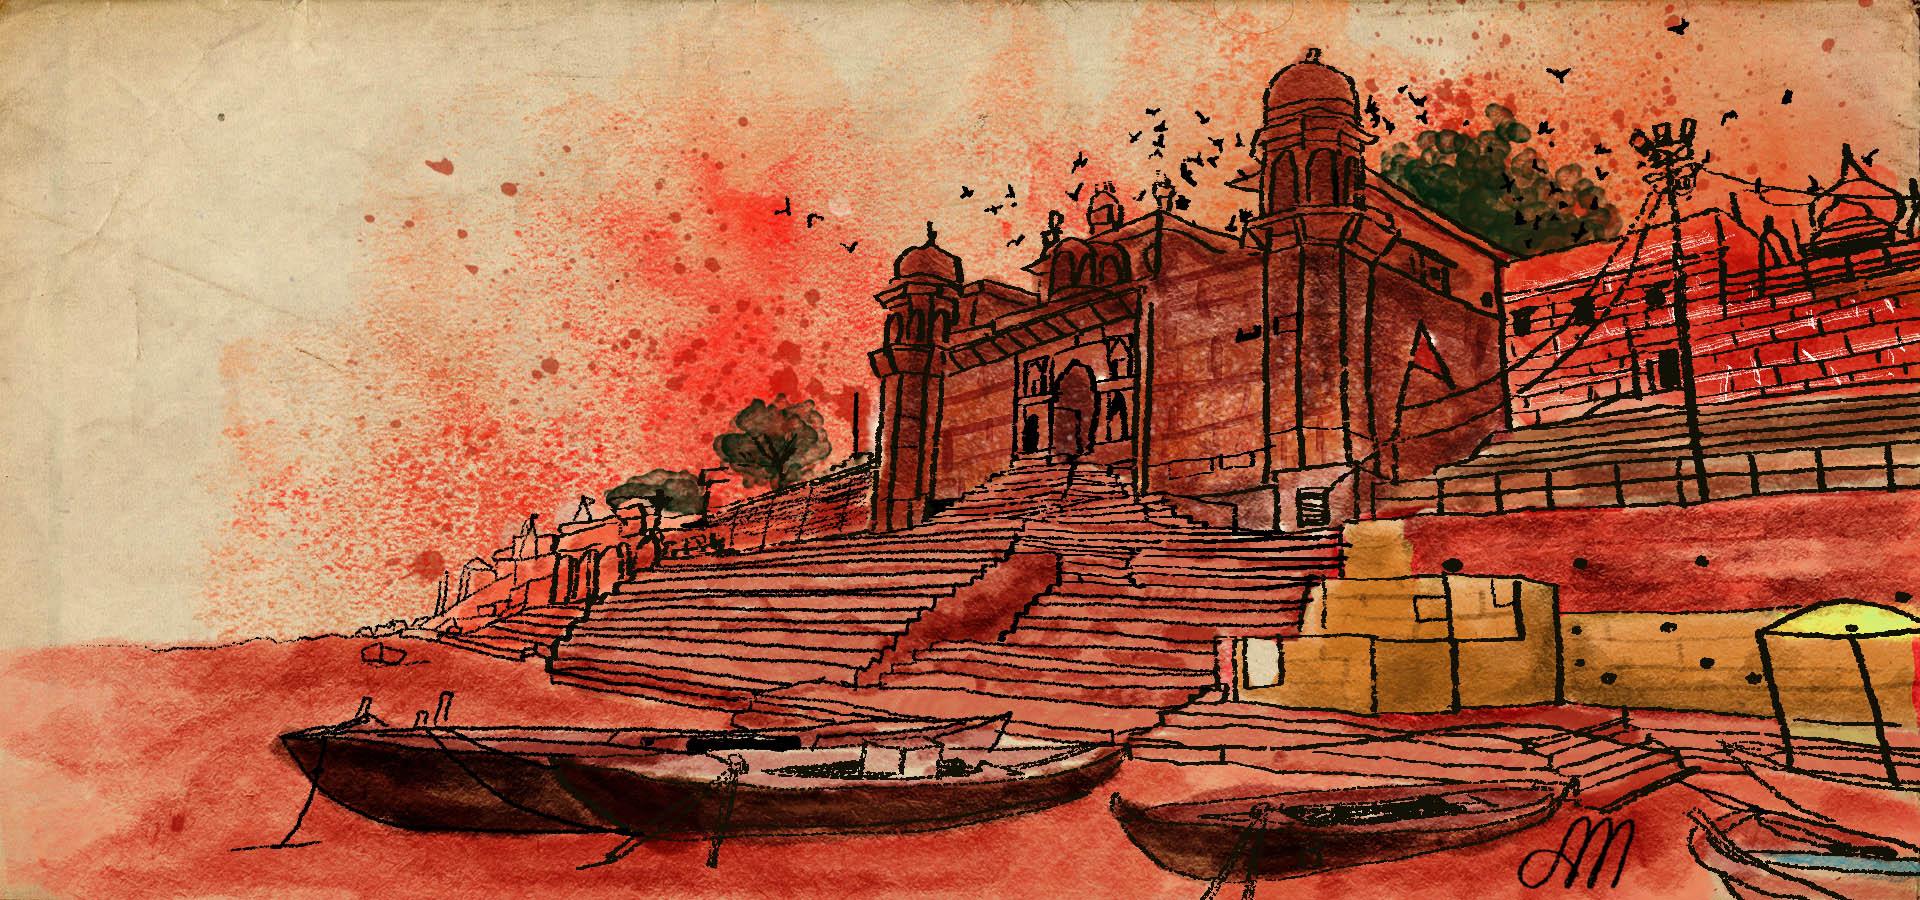 Banaras Illustrations for ohfab.in